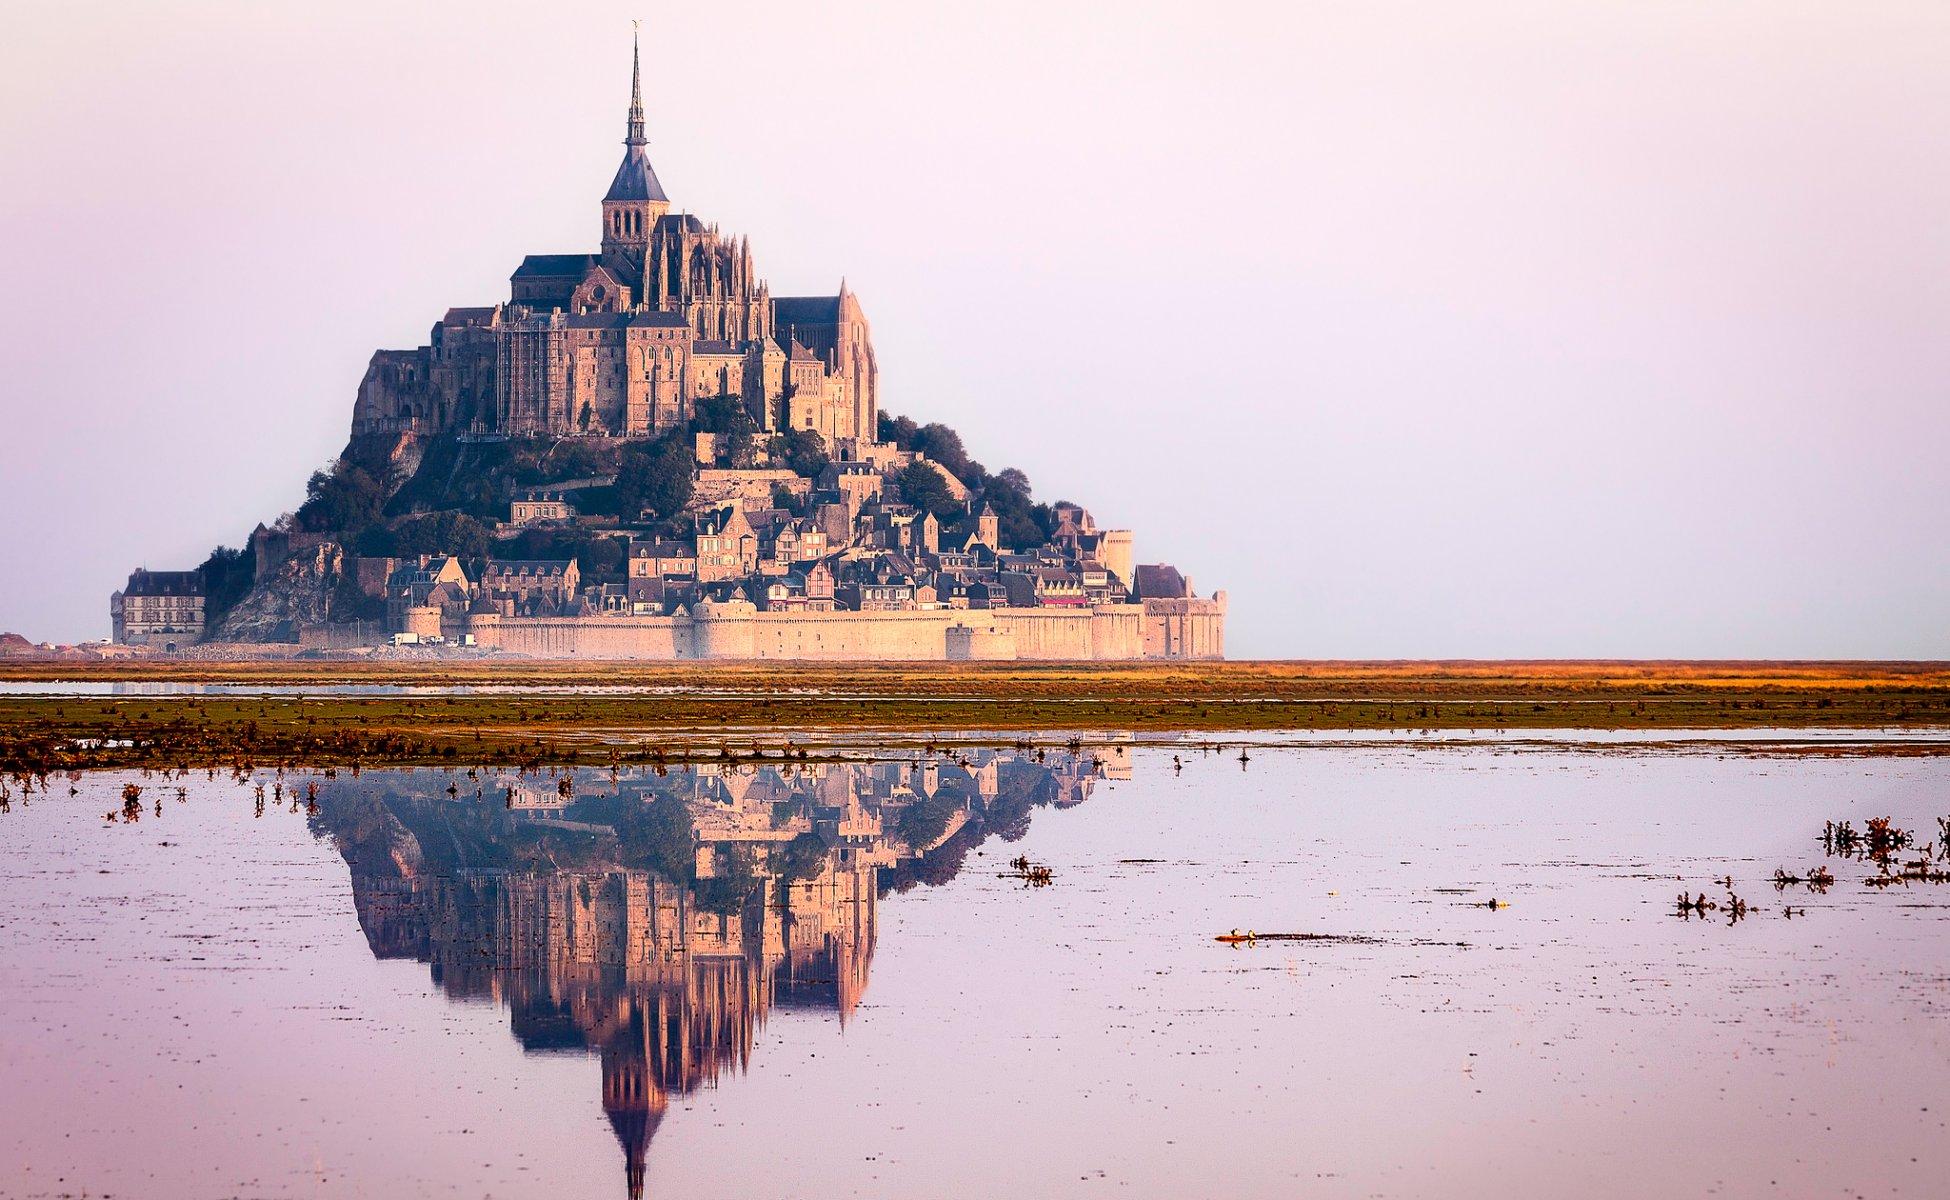 страны архитектура Франция река country architecture France river скачать